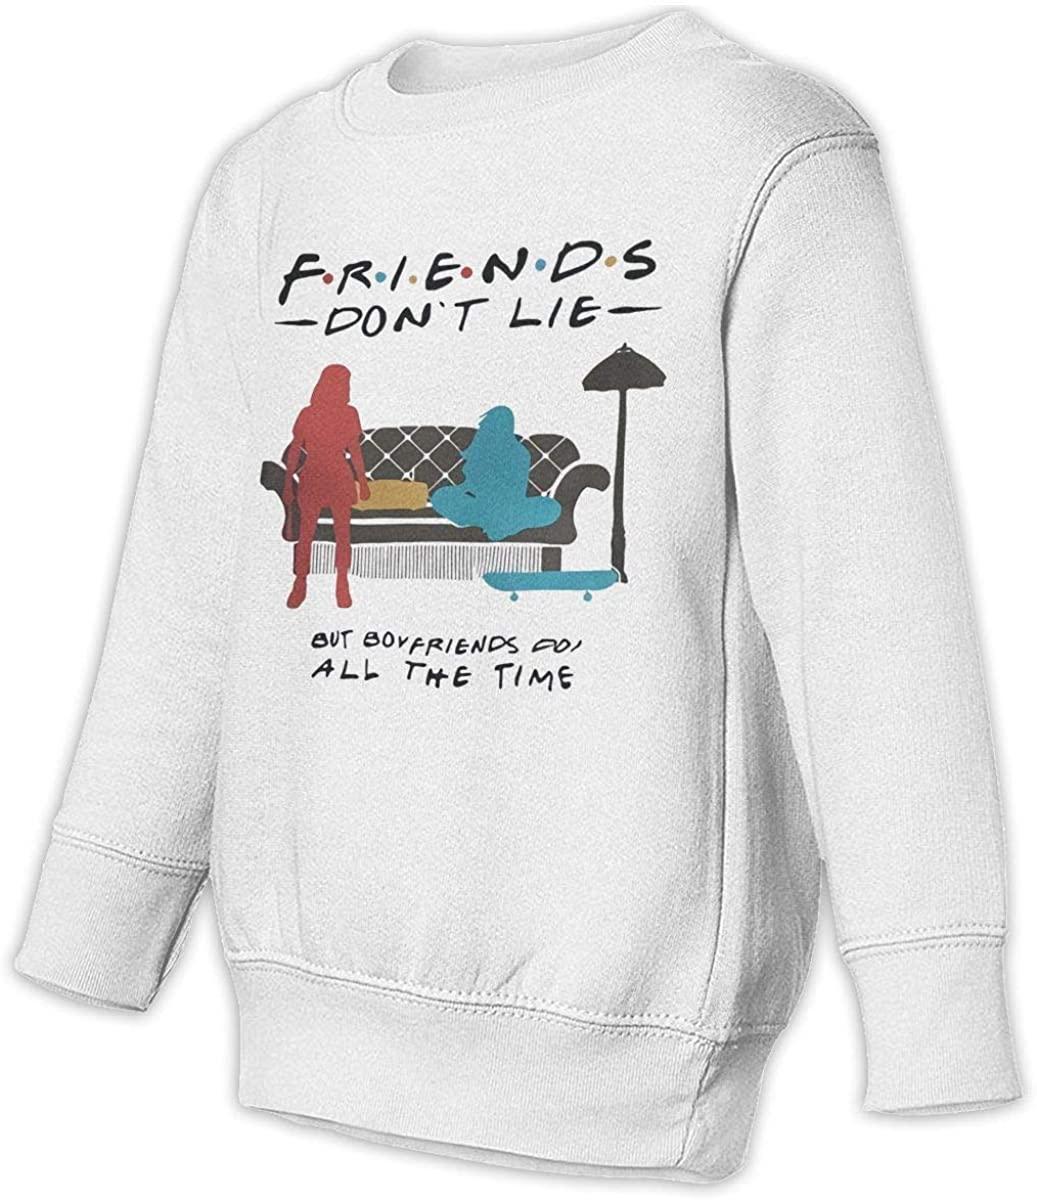 NOT Friends Don't Lie Unisex Sweatshirt Youth Boy and Girls Pullover Sweatshirt White